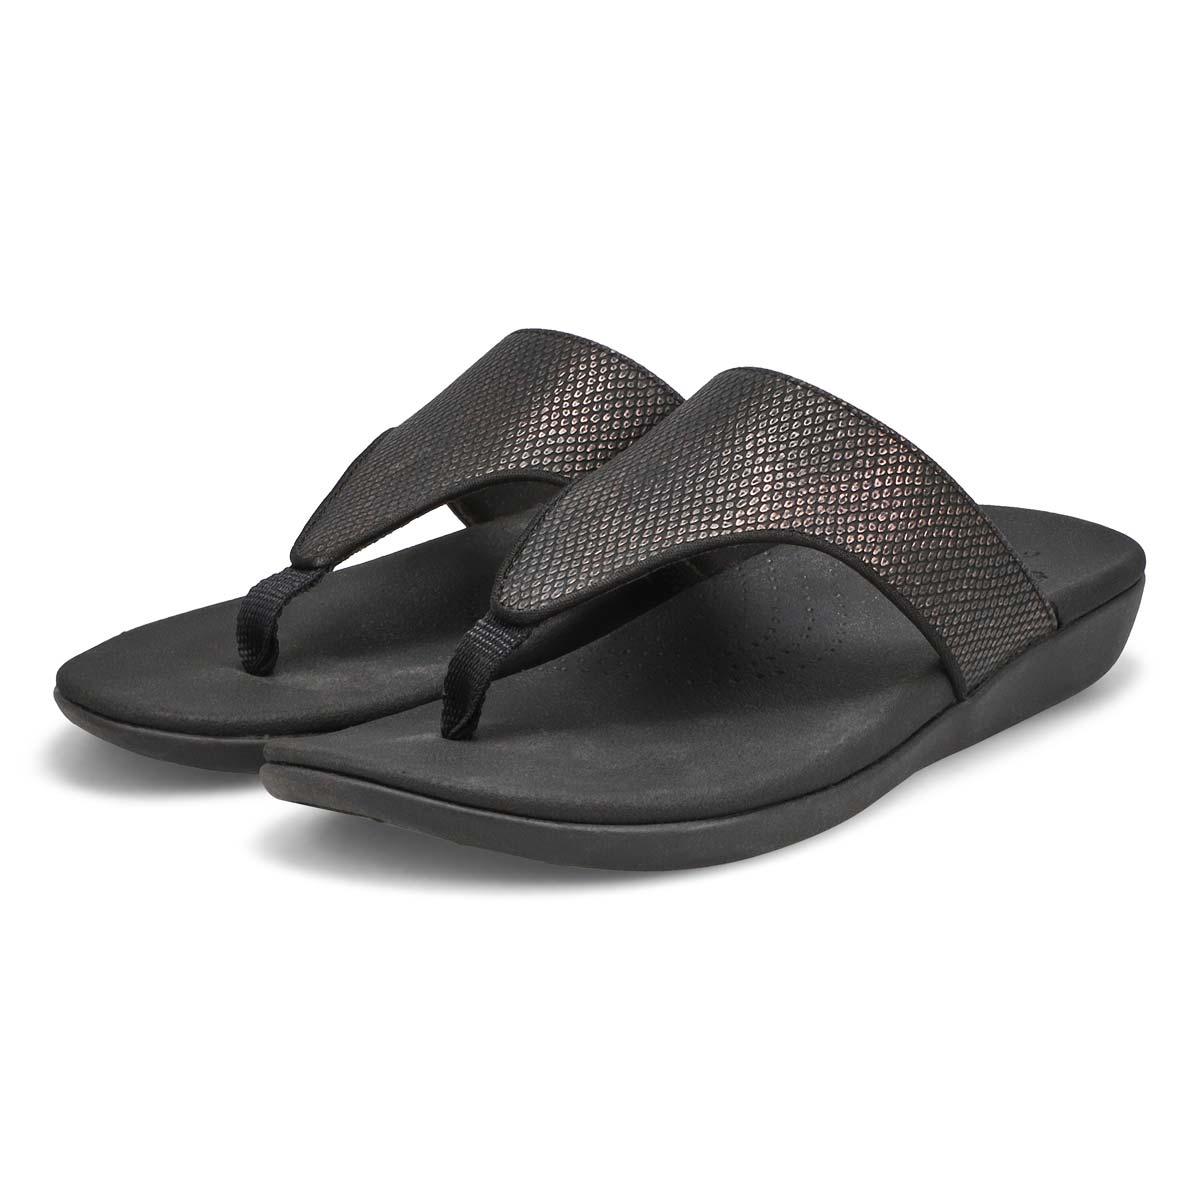 Lds Brio Vibe black snake thong sandal